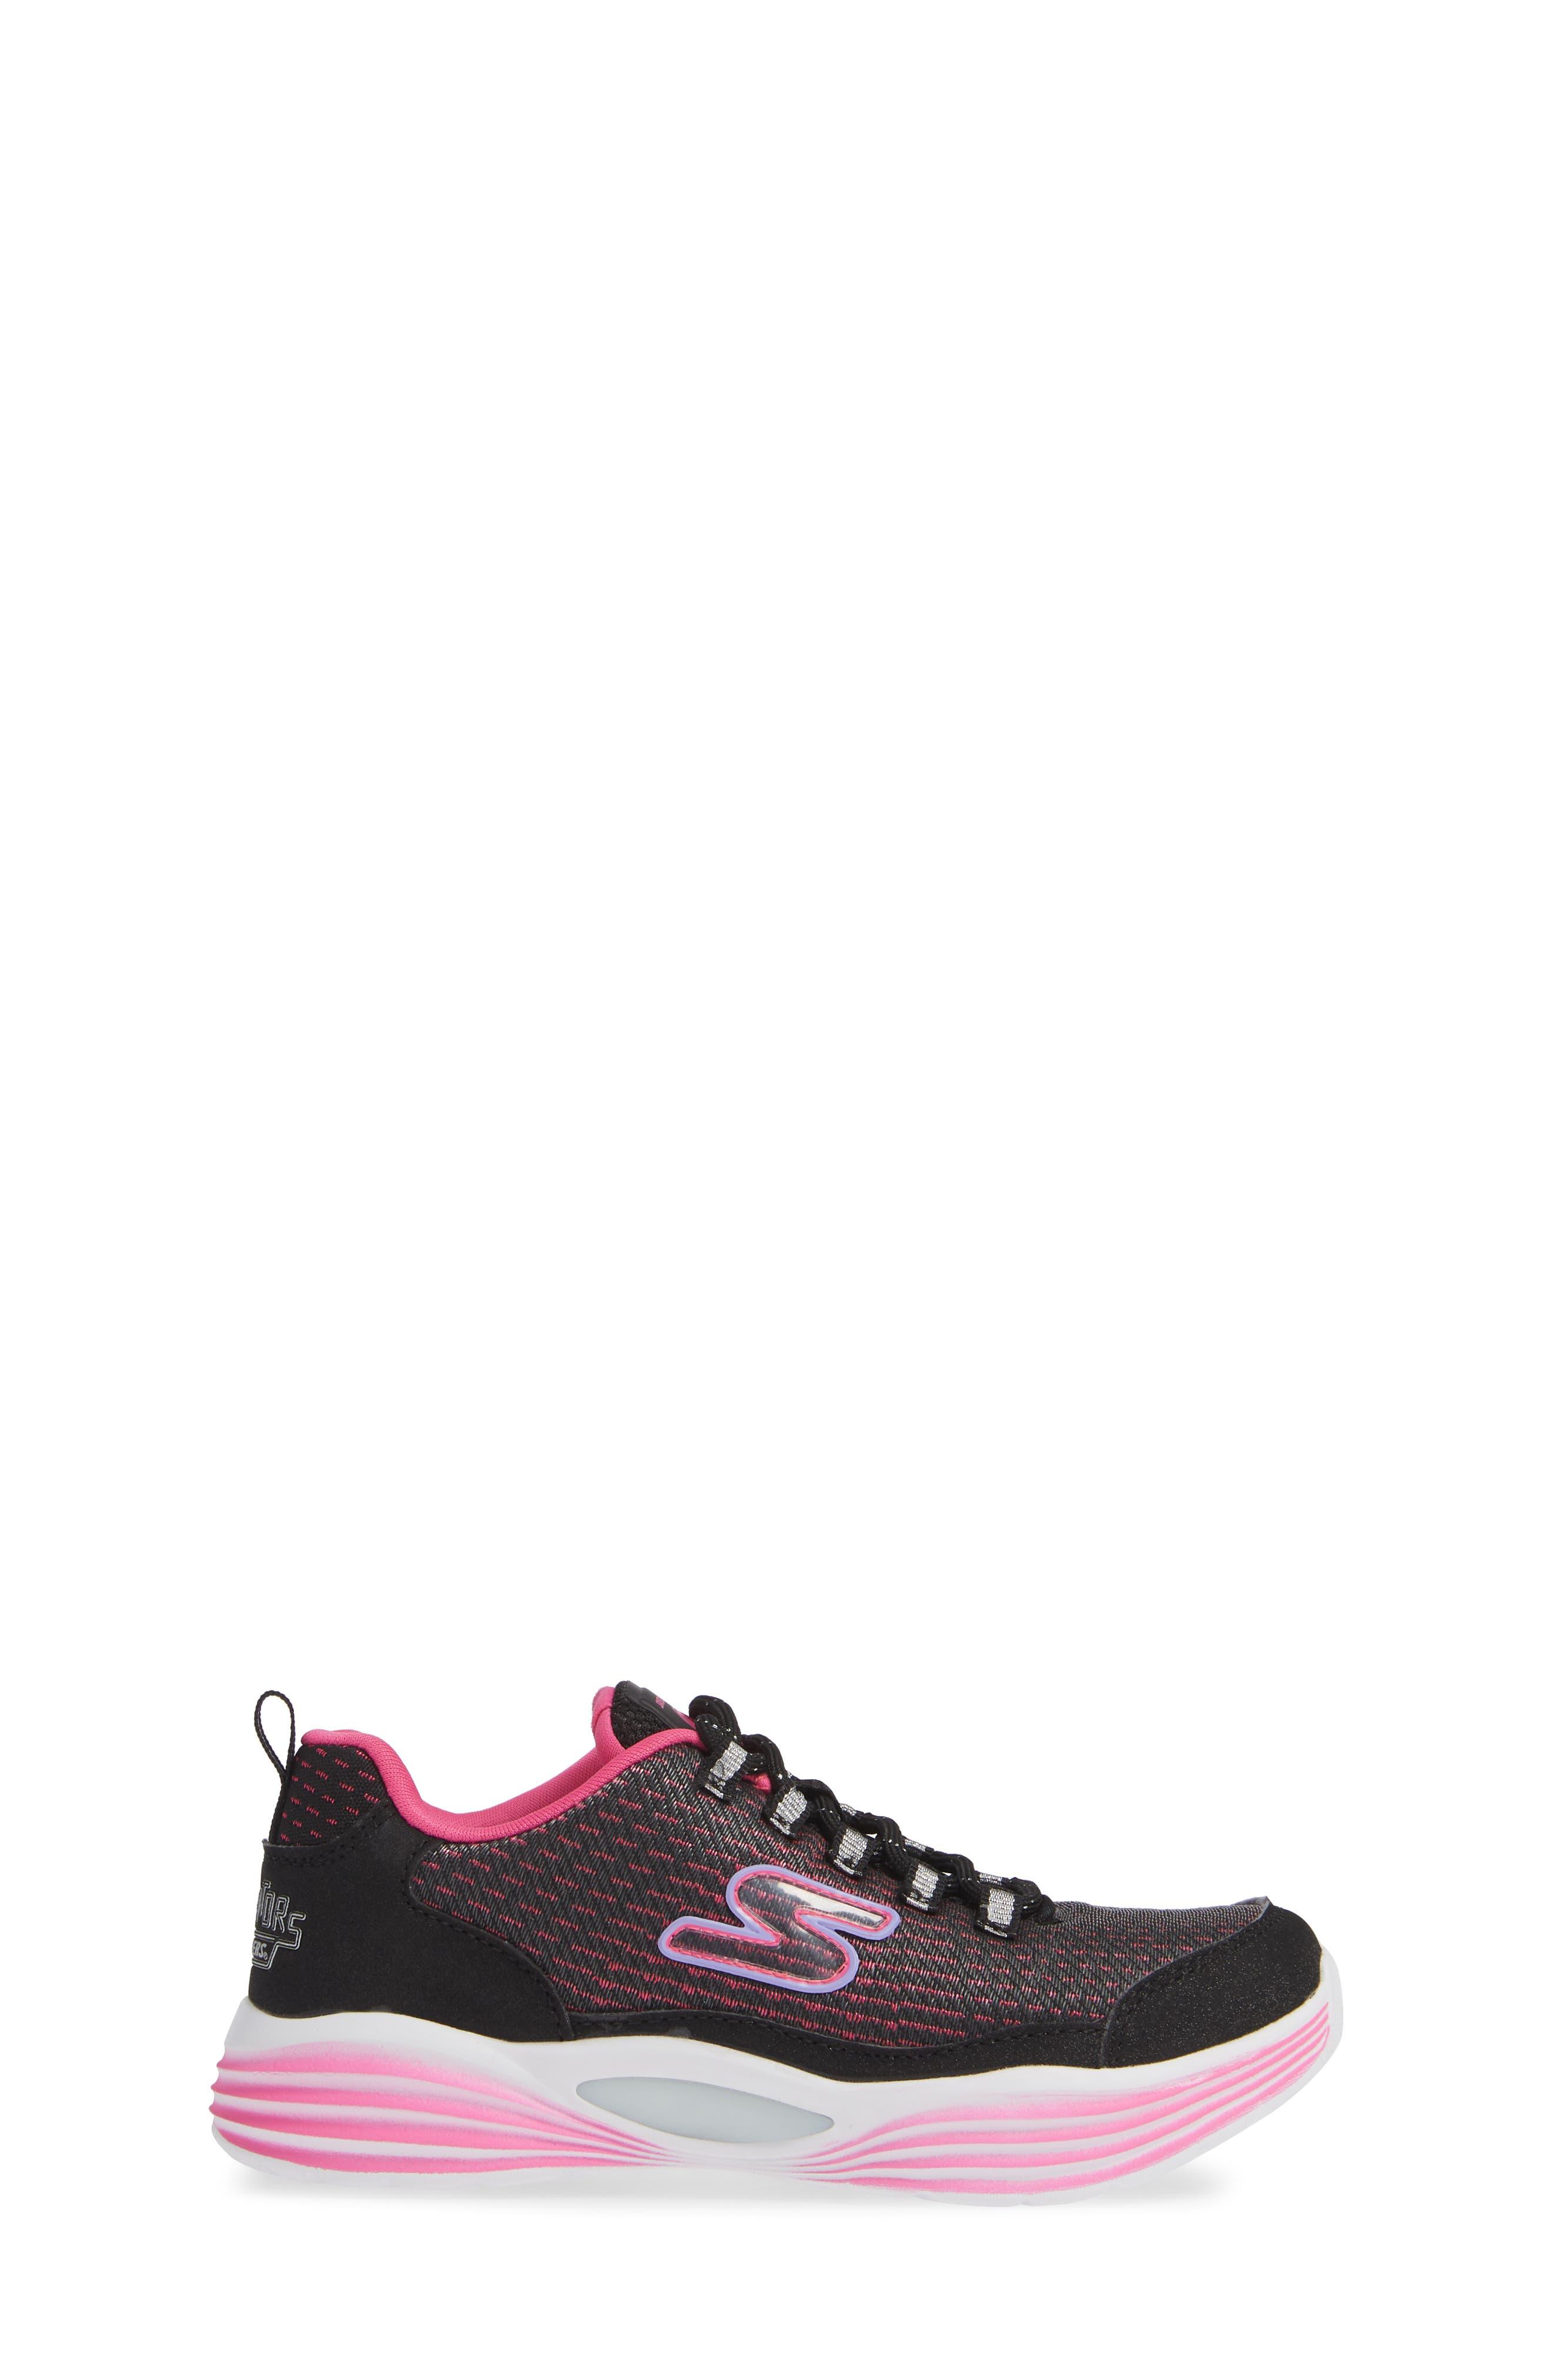 Luminator Light Up Sneaker,                             Alternate thumbnail 3, color,                             BLACK/ PINK